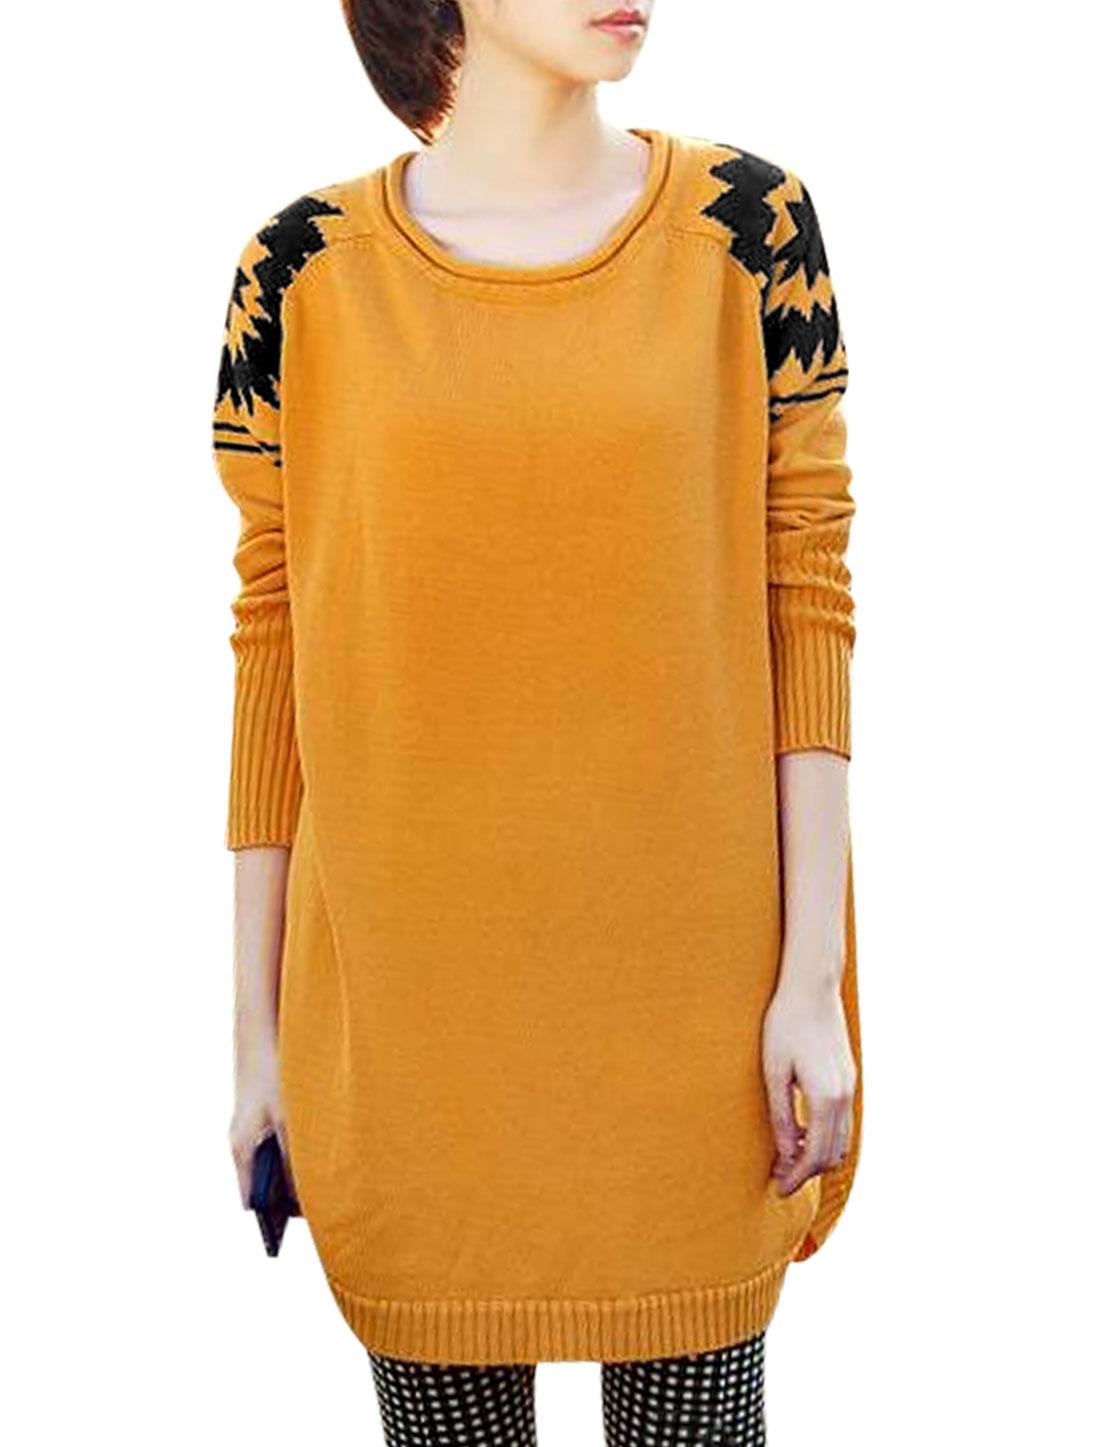 Ladies Yellow Round Neck Raglan Sleeves Pullover Casaul Sweater XS